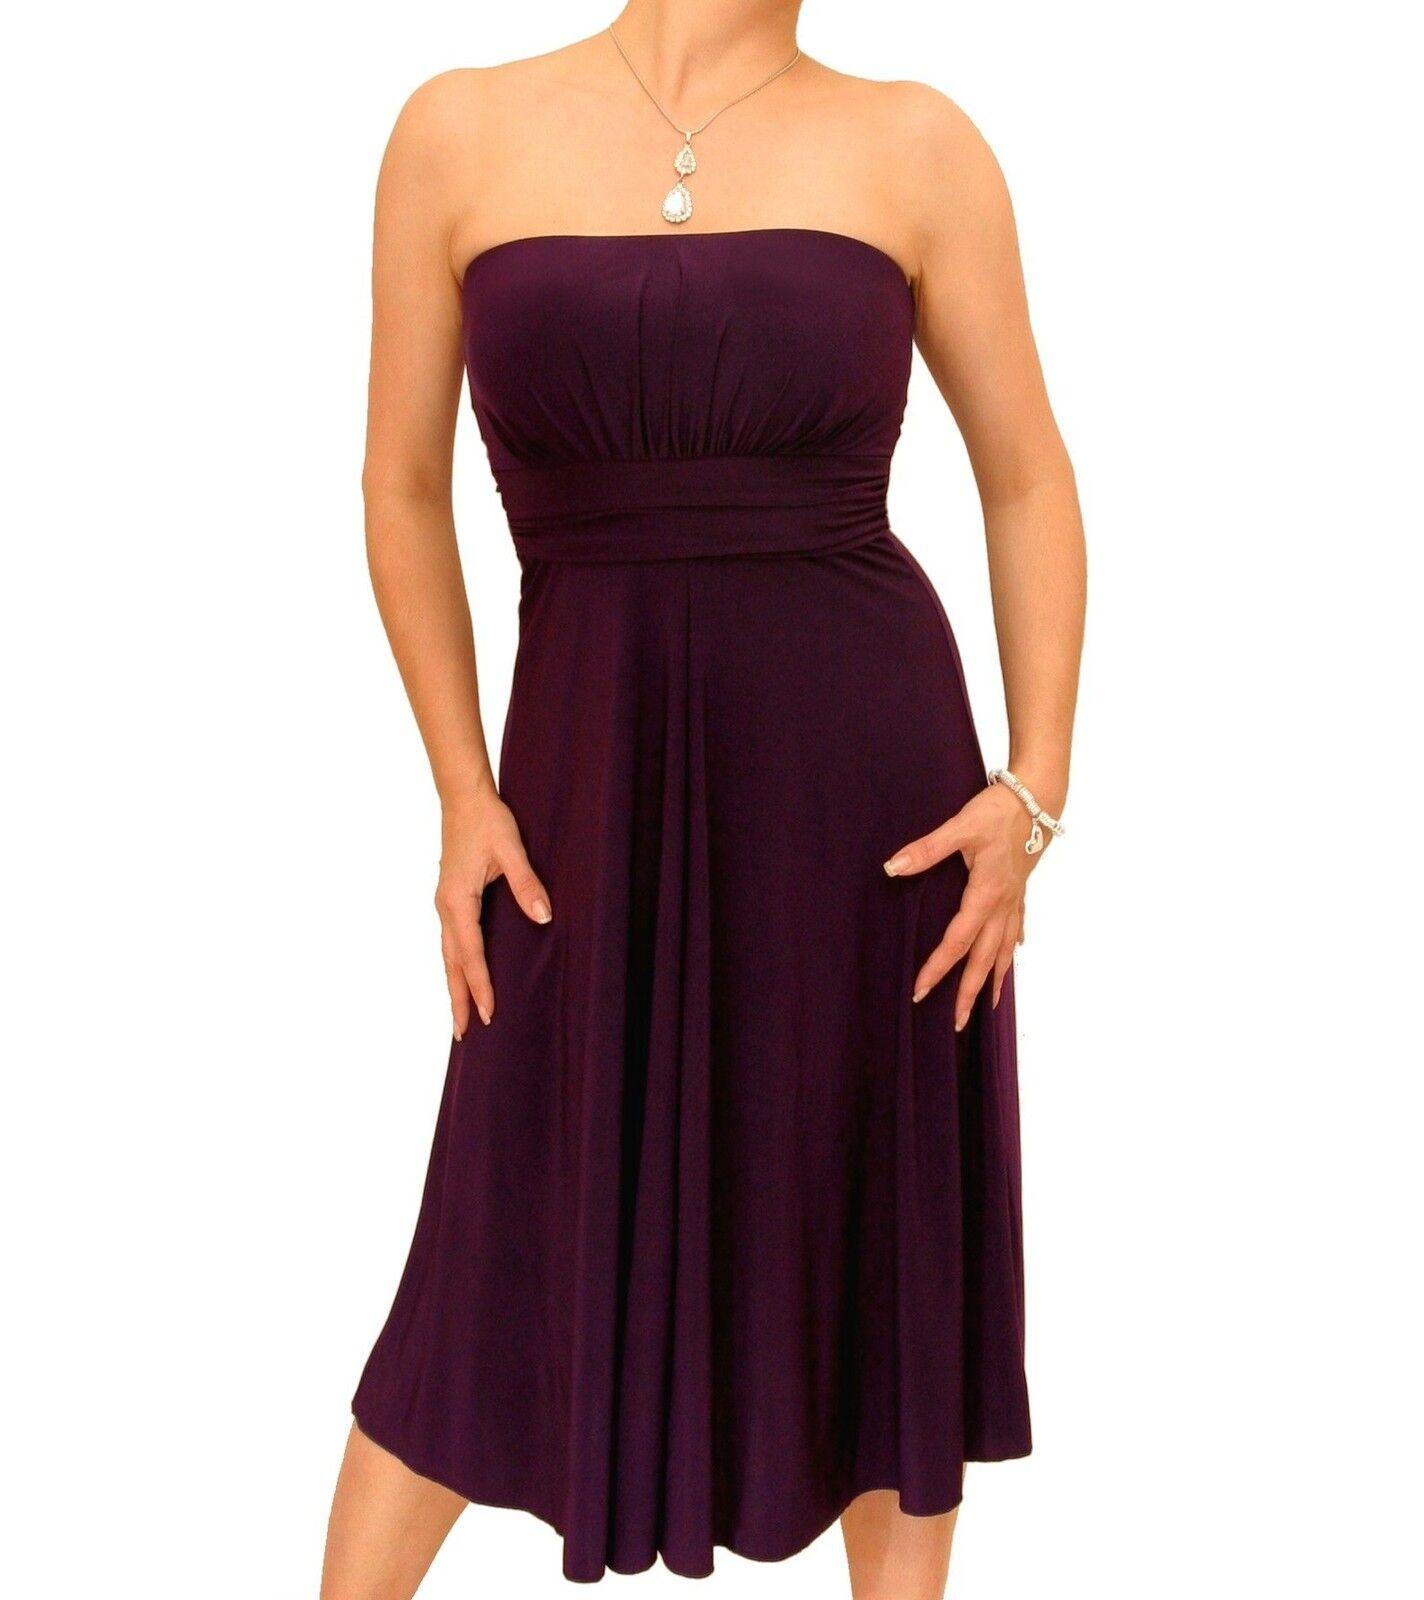 New Slinky Strapless A Line Dress - Knee Length